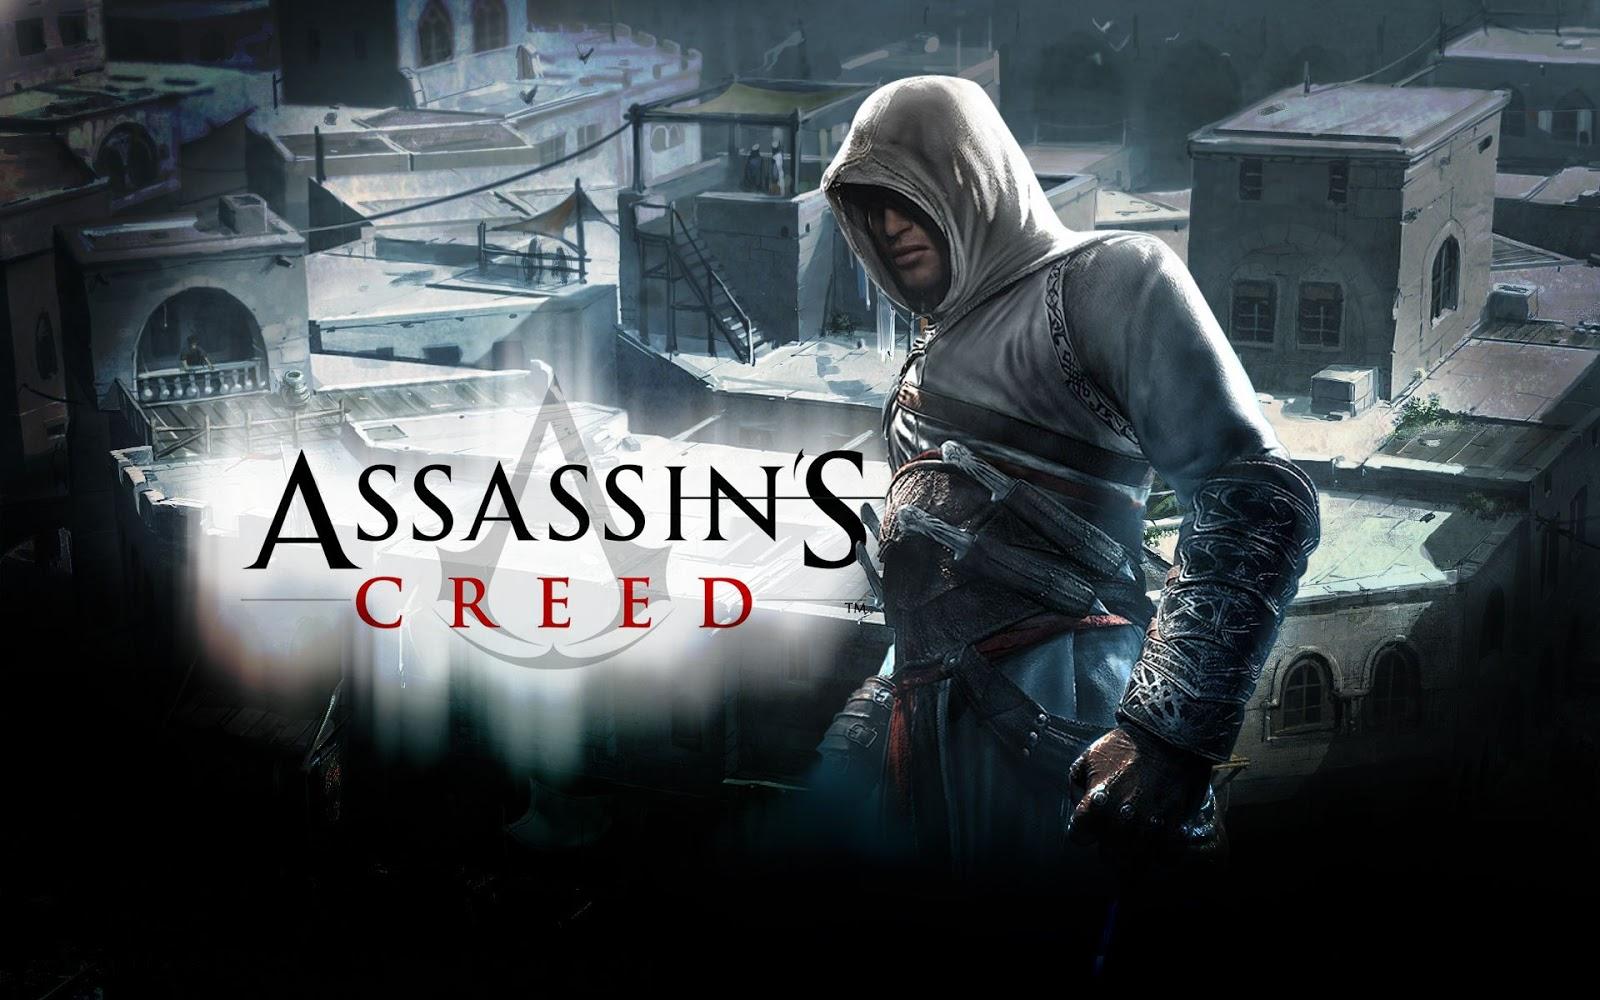 Alur Cerita Game Assassin S Creed Alur Cerita Game Assassin S Creed